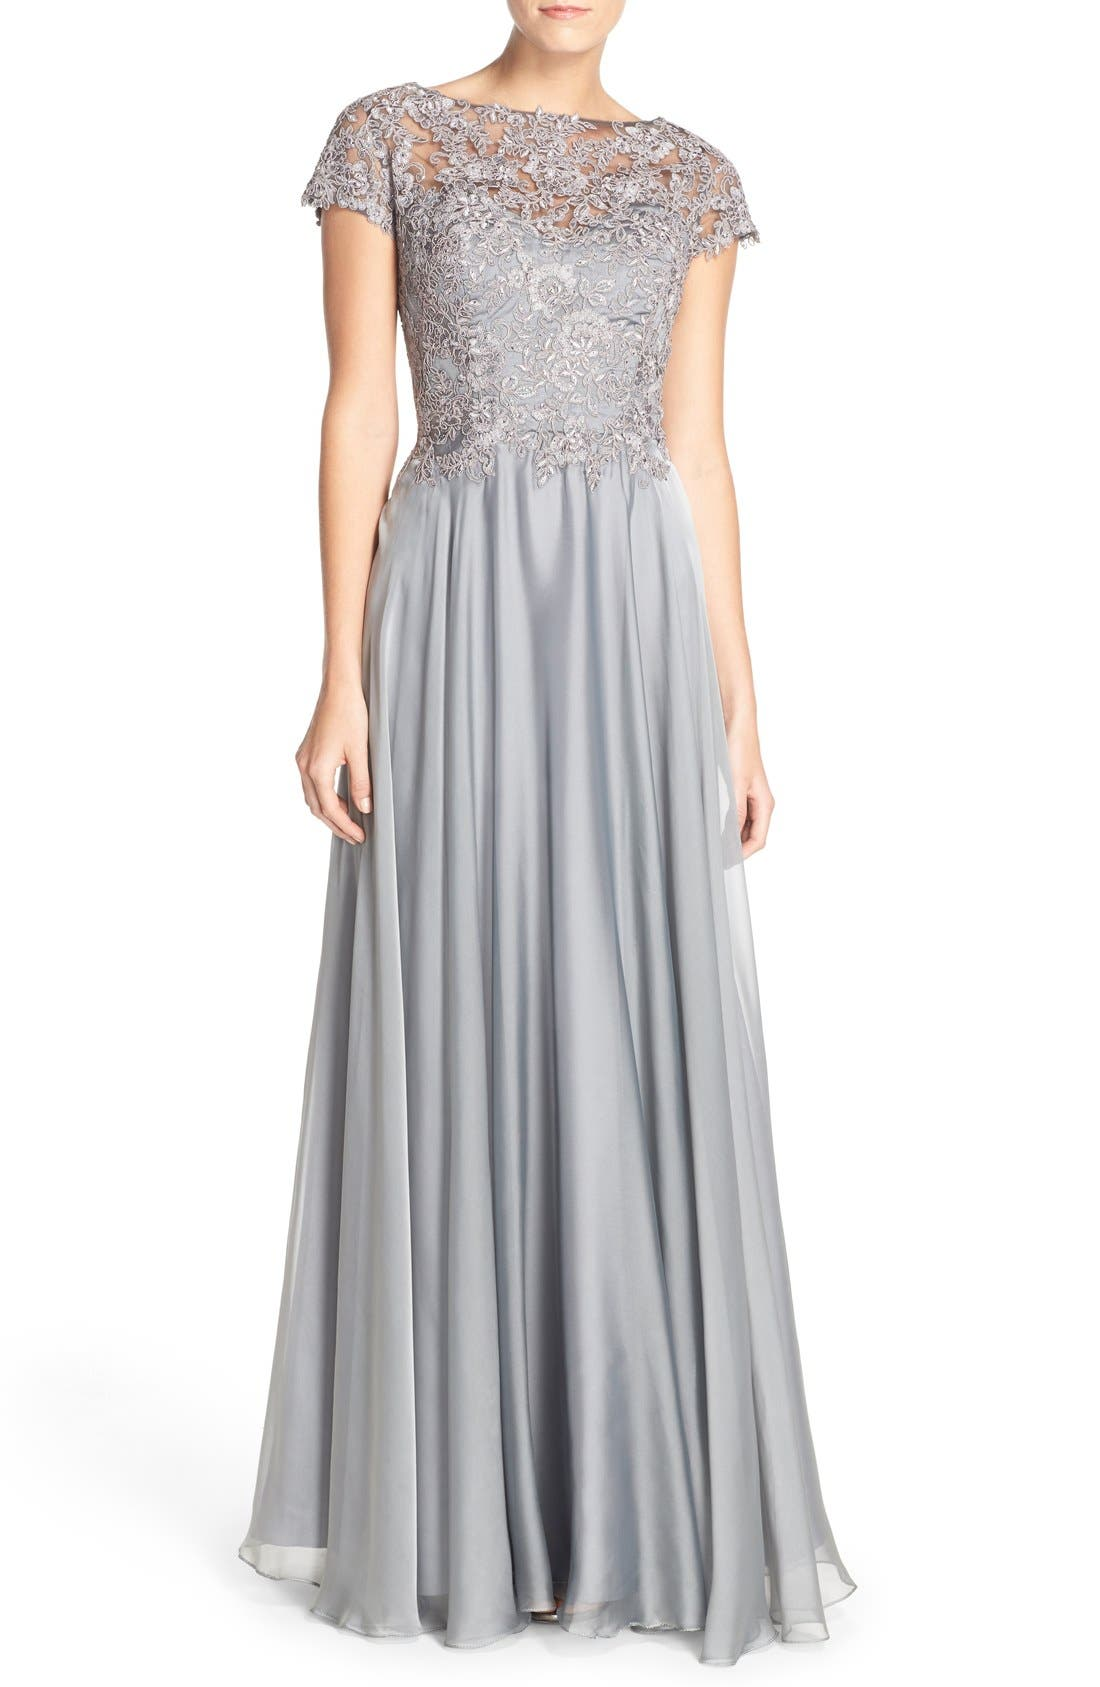 Main Image - La Femme Embellished Lace & Satin Ballgown